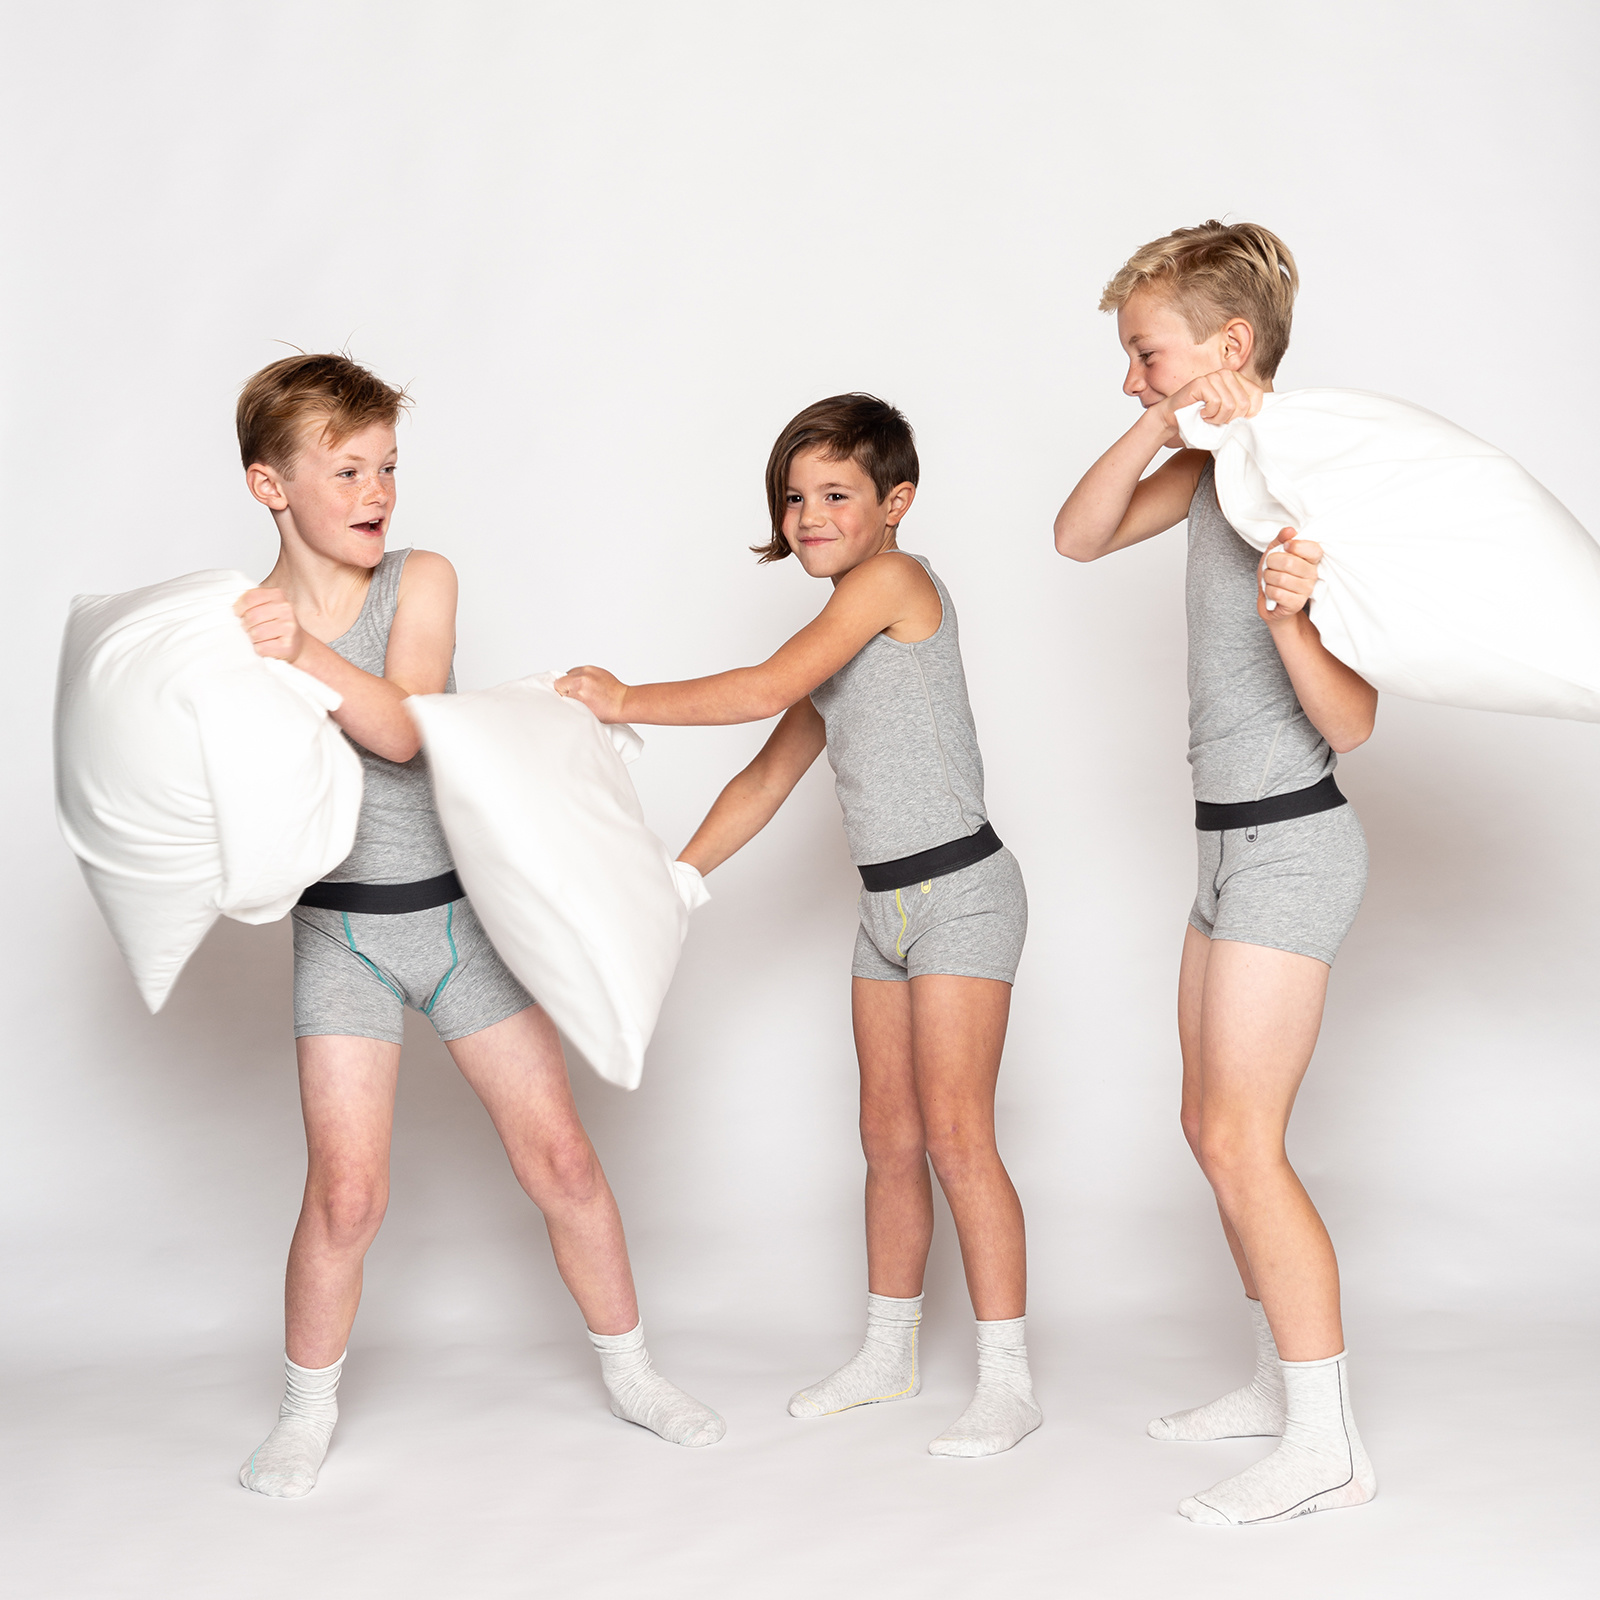 https://www.samsensoryclothing.com/nl/super-zachte-kleding/ondergoed/boxershorts-jongens/